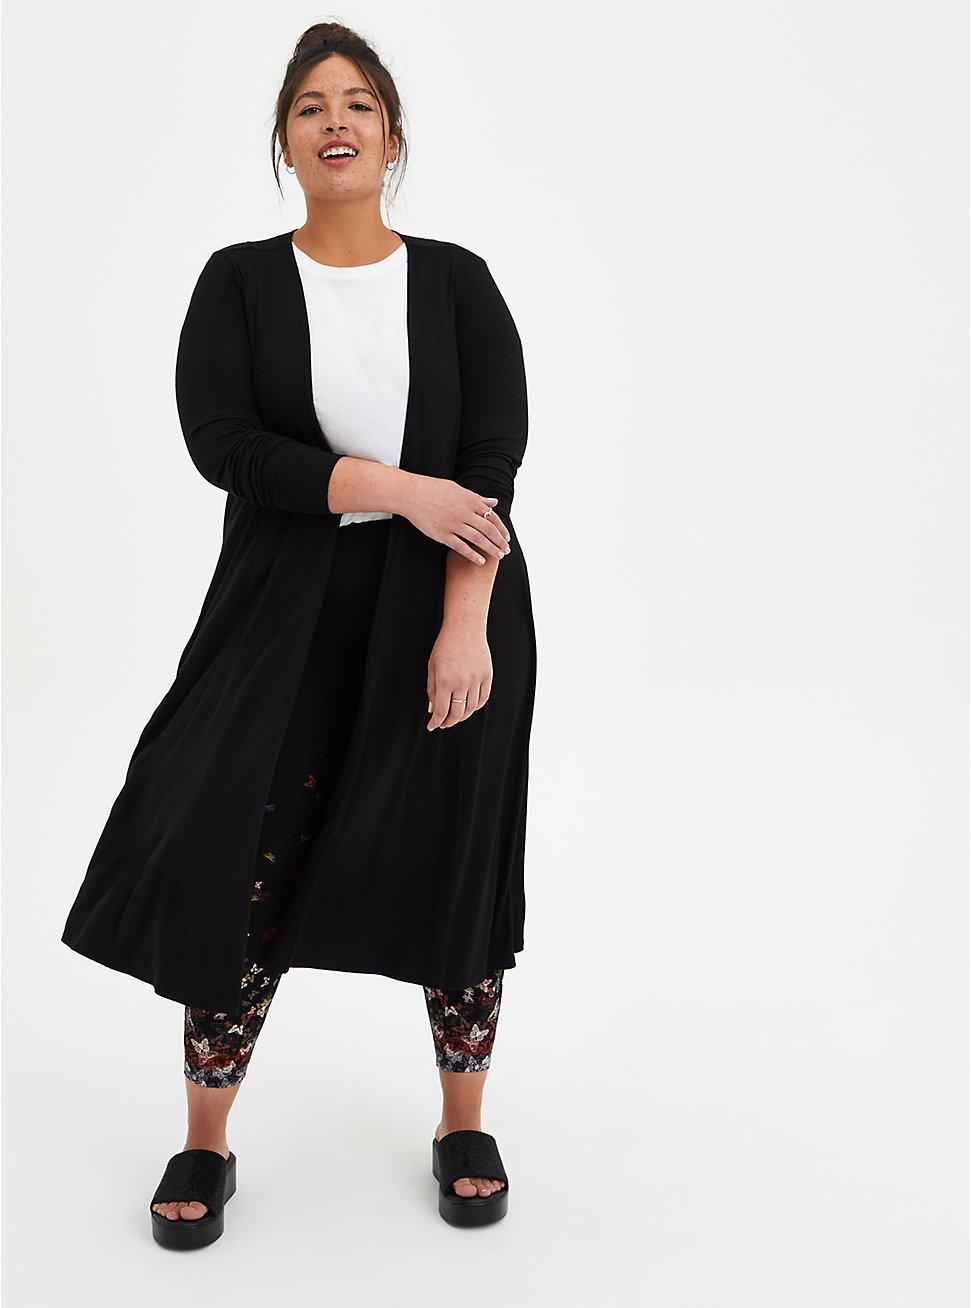 Fit & Flare Cardigan Sweater - Super Soft Black , DEEP BLACK, hi-res